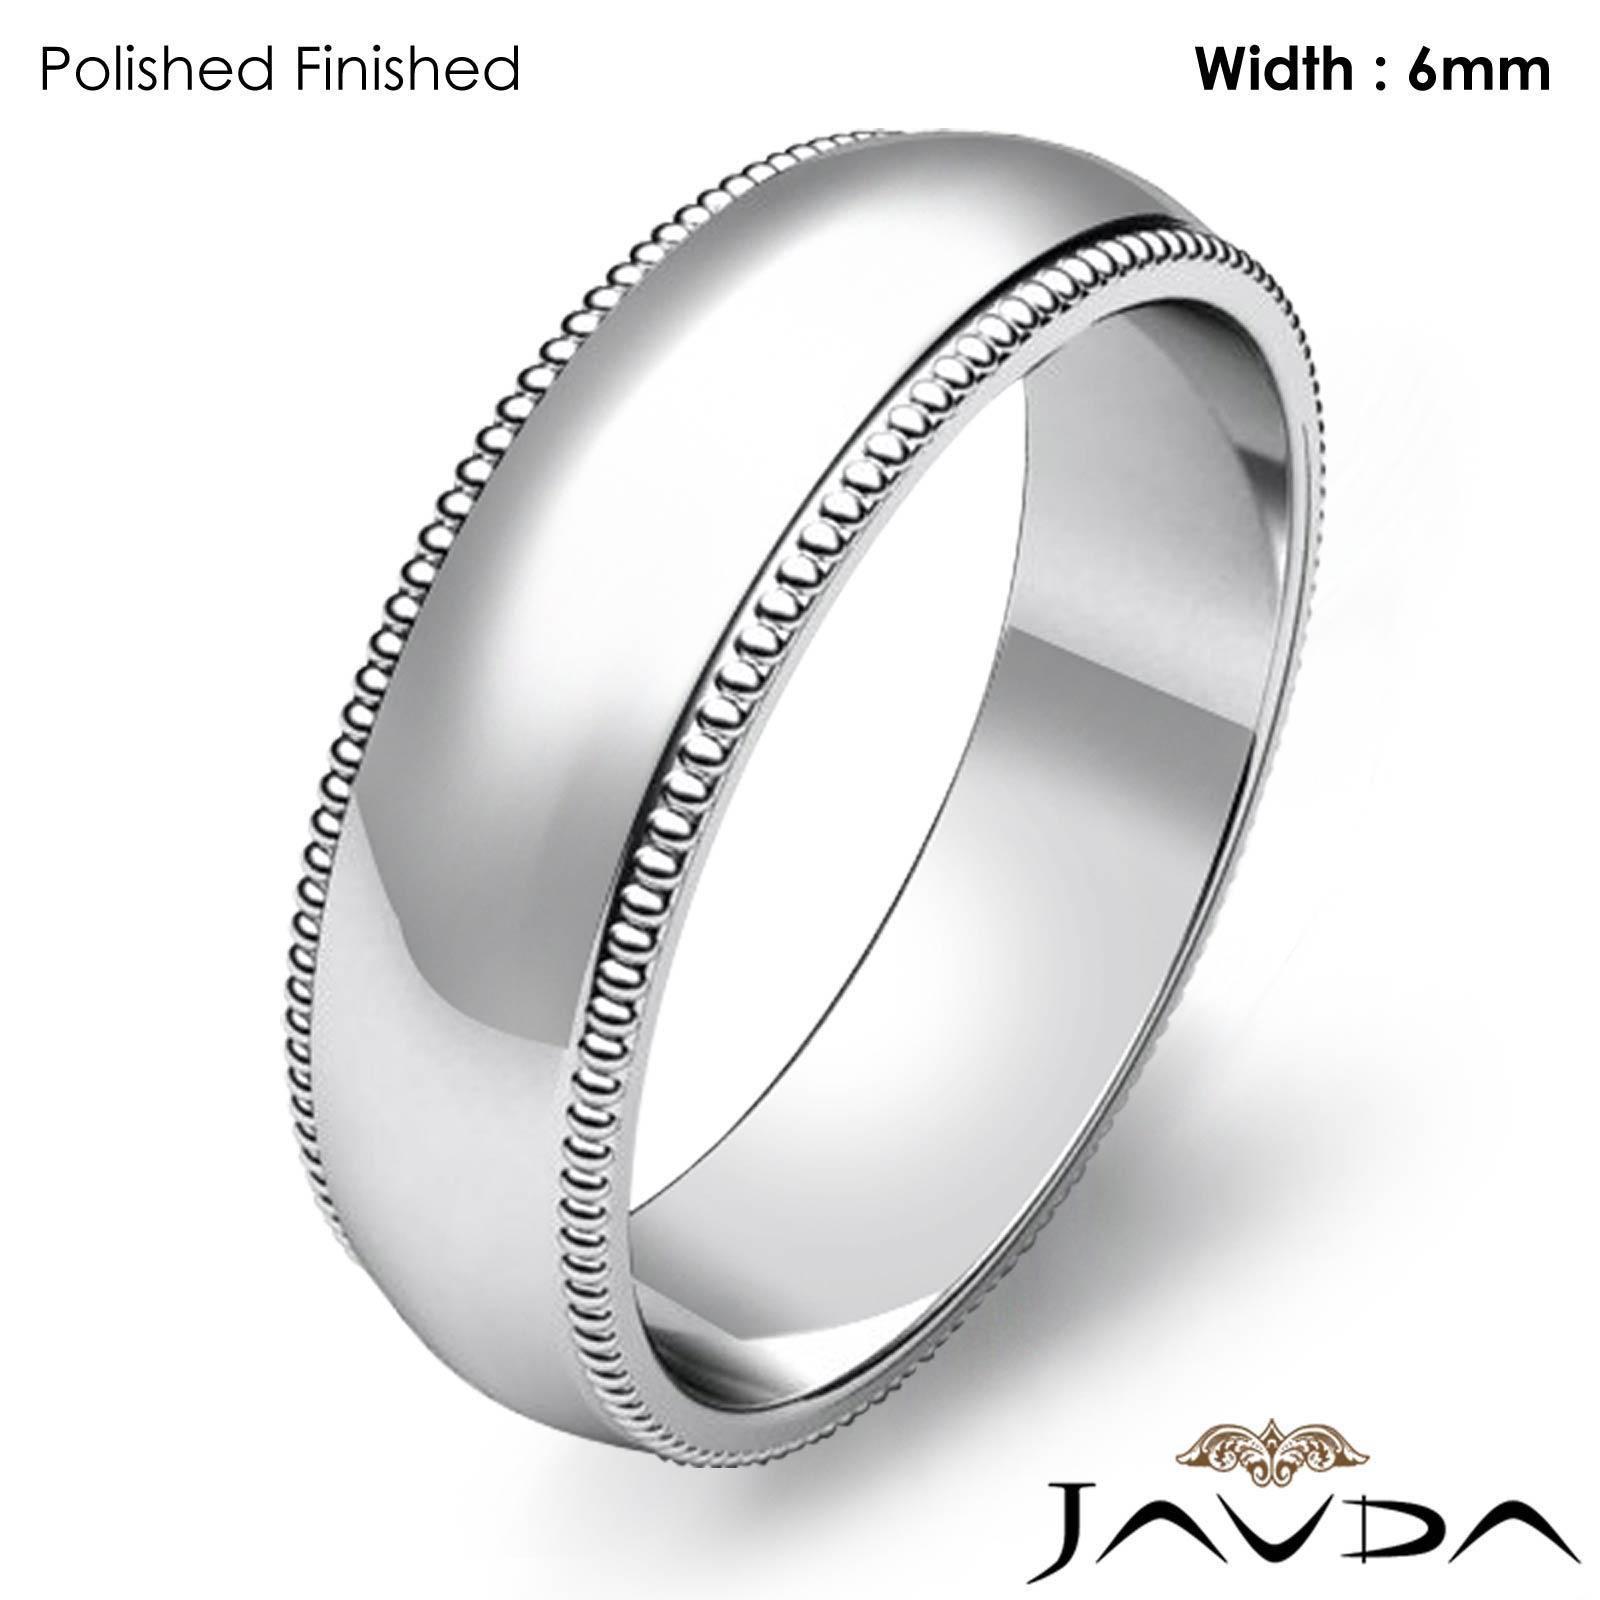 Milgrain Men S Wedding Ring In Platinum 6mm: Solid Men Wedding Band Dome Milgrain Edge Classic Ring 6mm